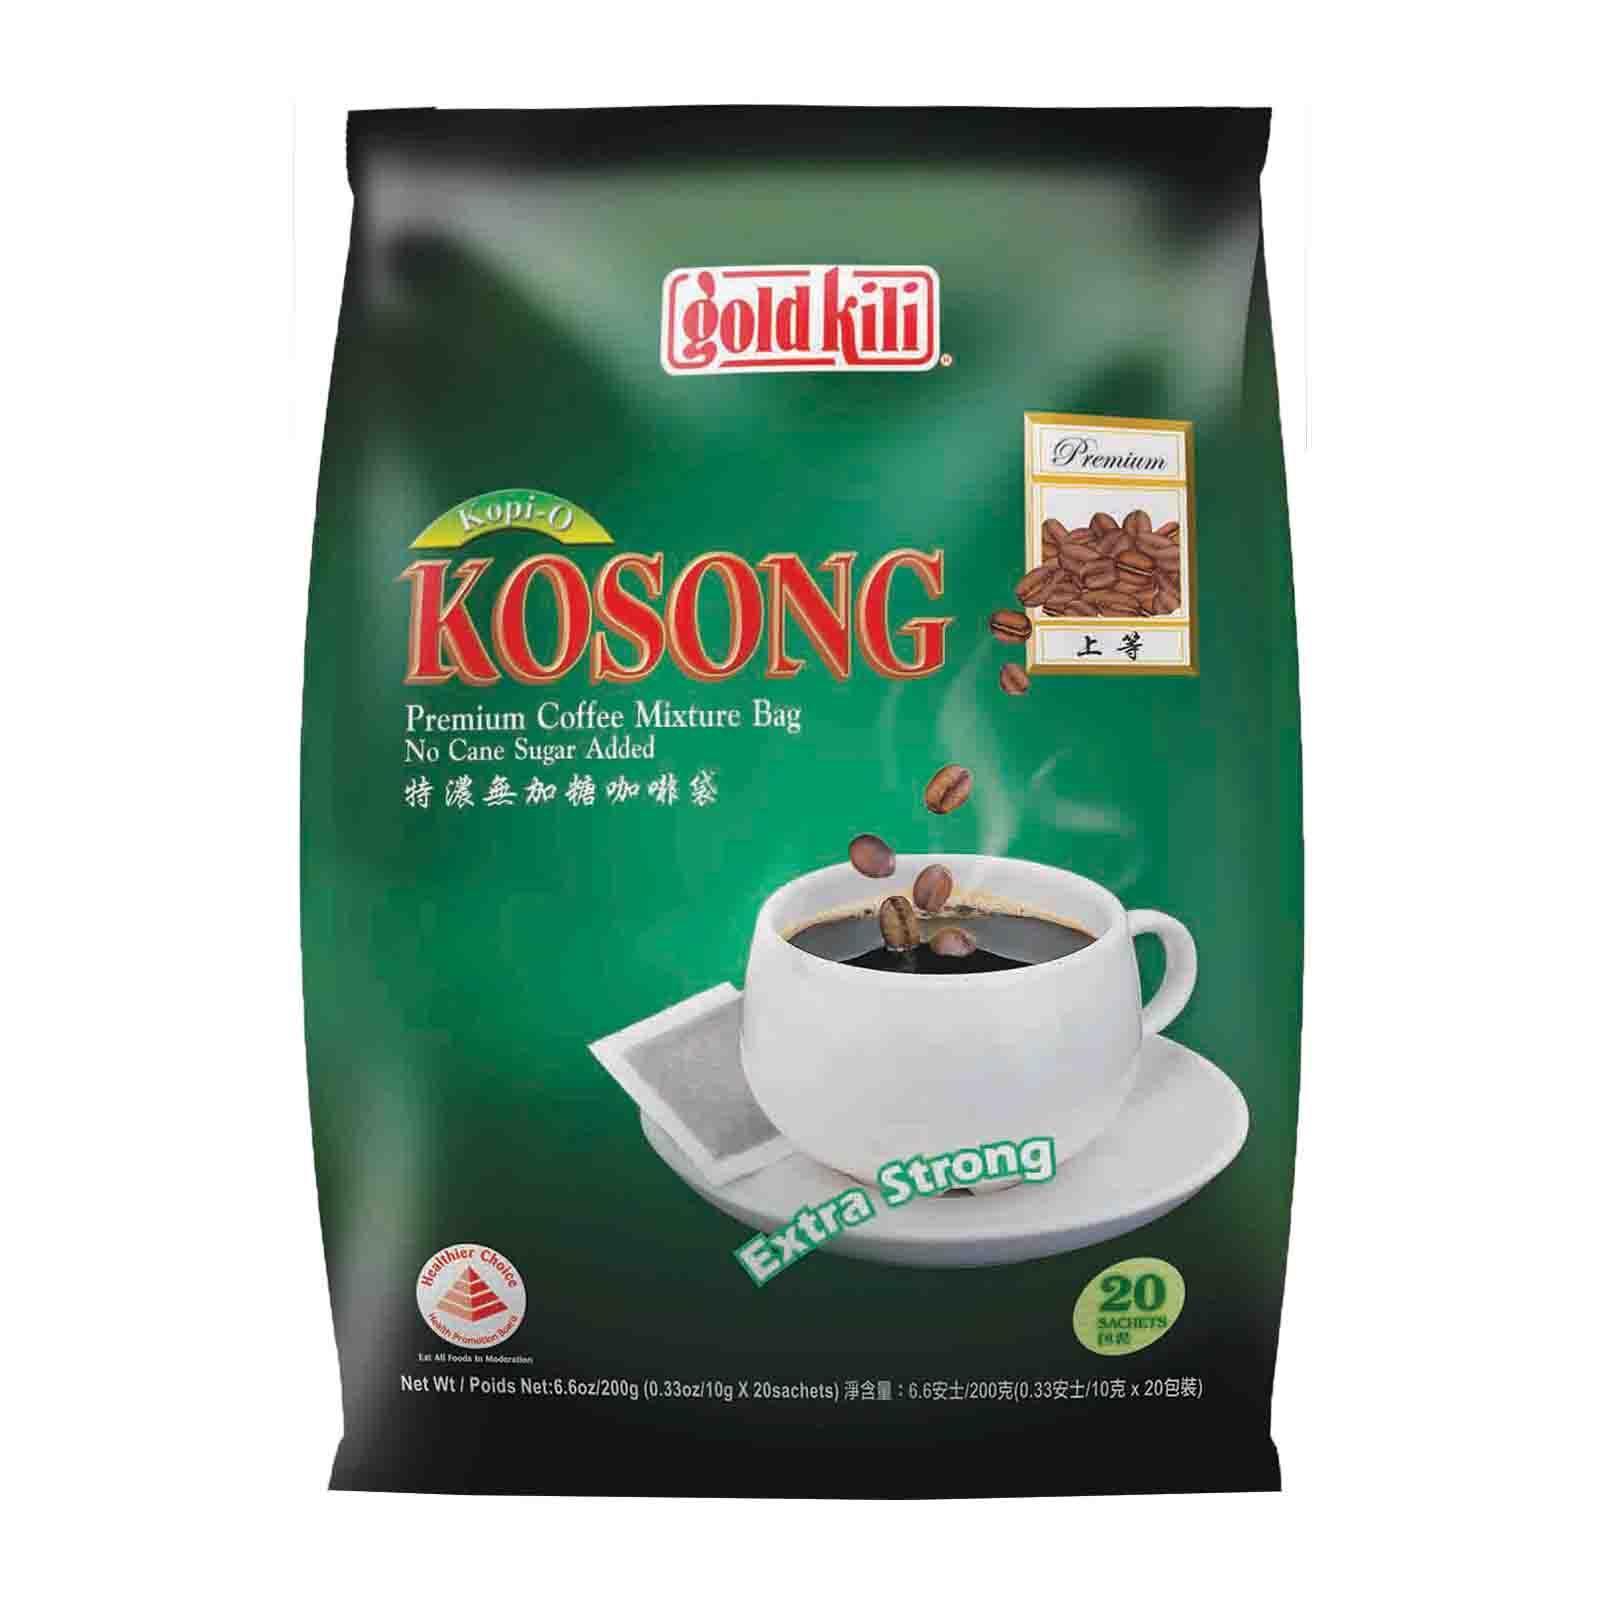 Gold Kili Kopi-O Kosong Premium Coffee Mixture Bag